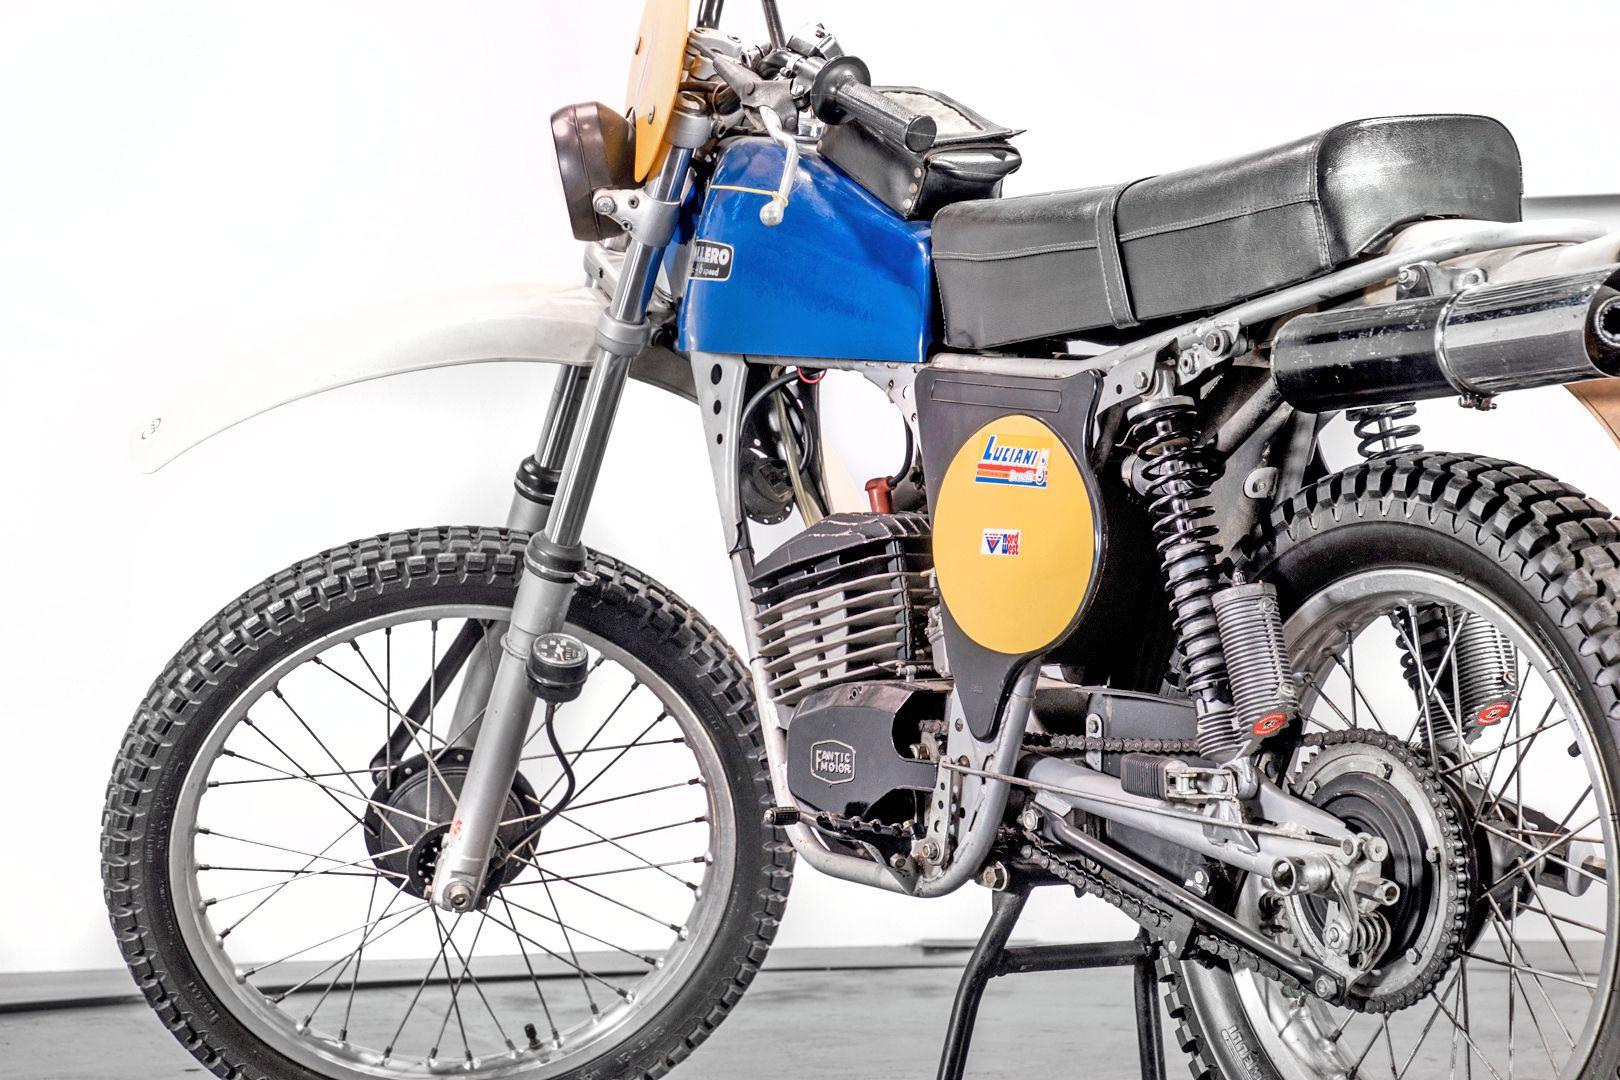 1980 Fantic Motor 125 74648